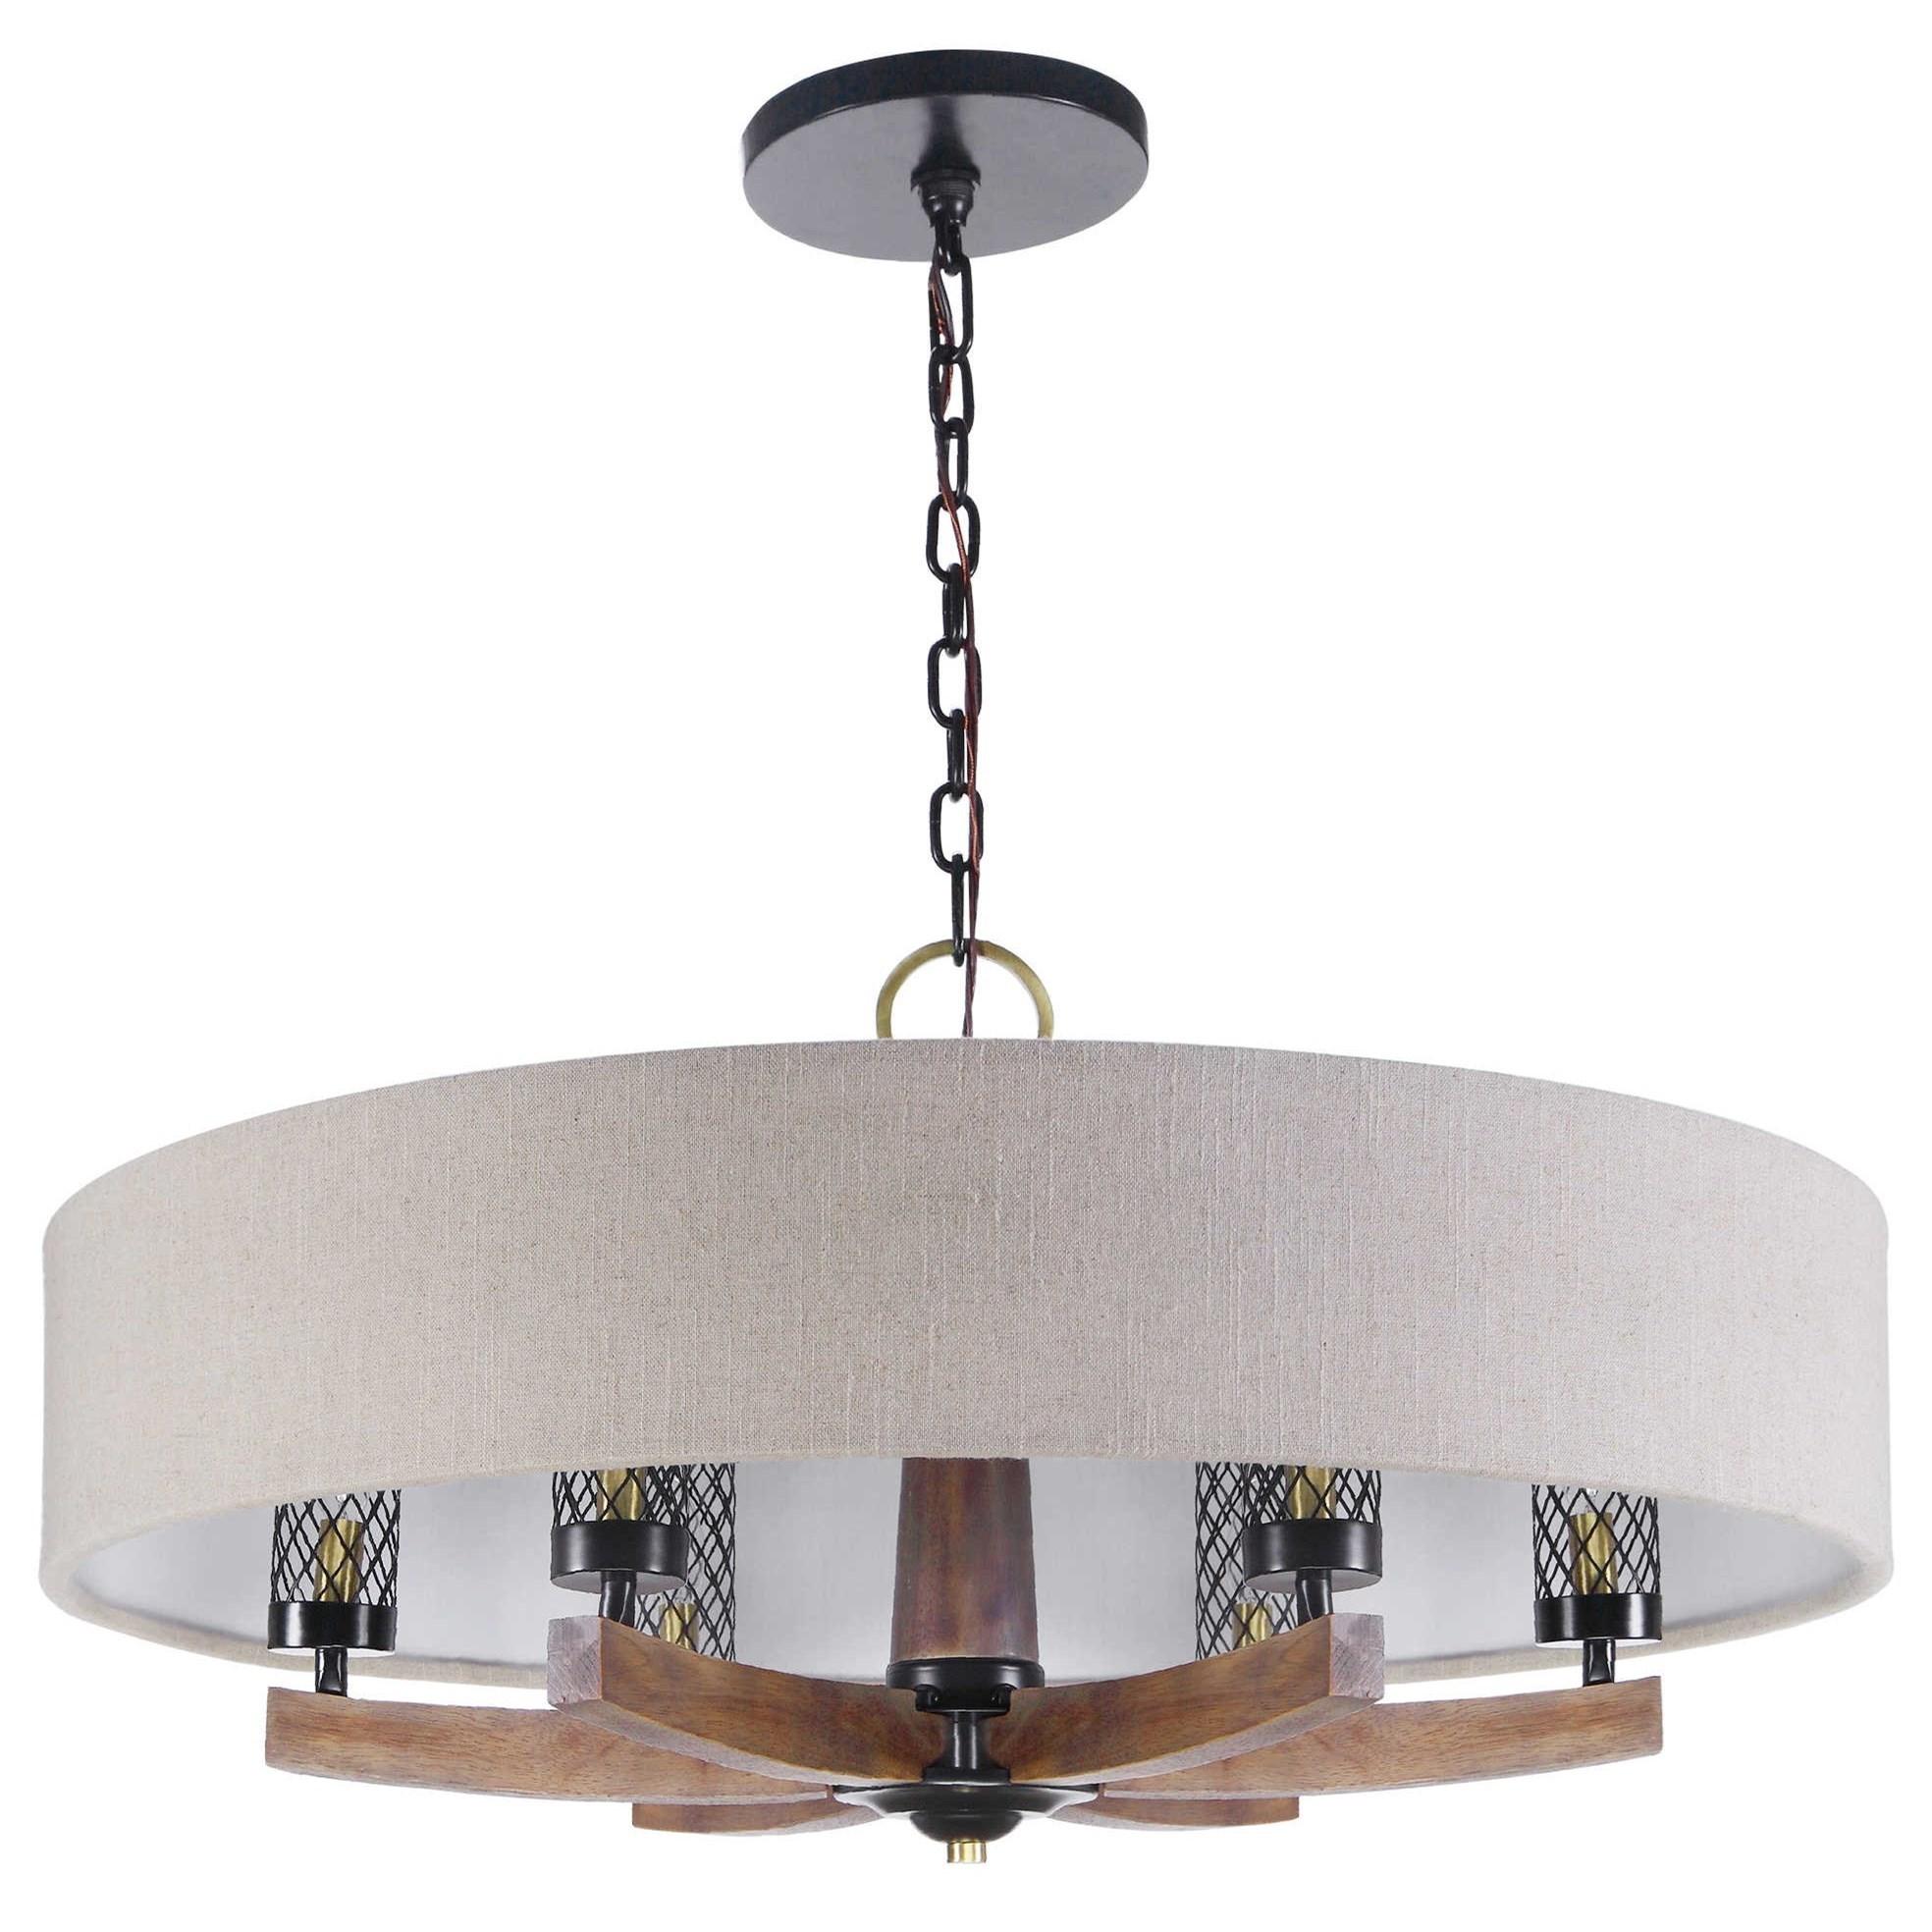 Uttermost Lighting Fixtures Chandeliers 21331 Woodall 6 Light Drum Chandelier Dunk Bright Furniture Pendant Lights Chandeliers